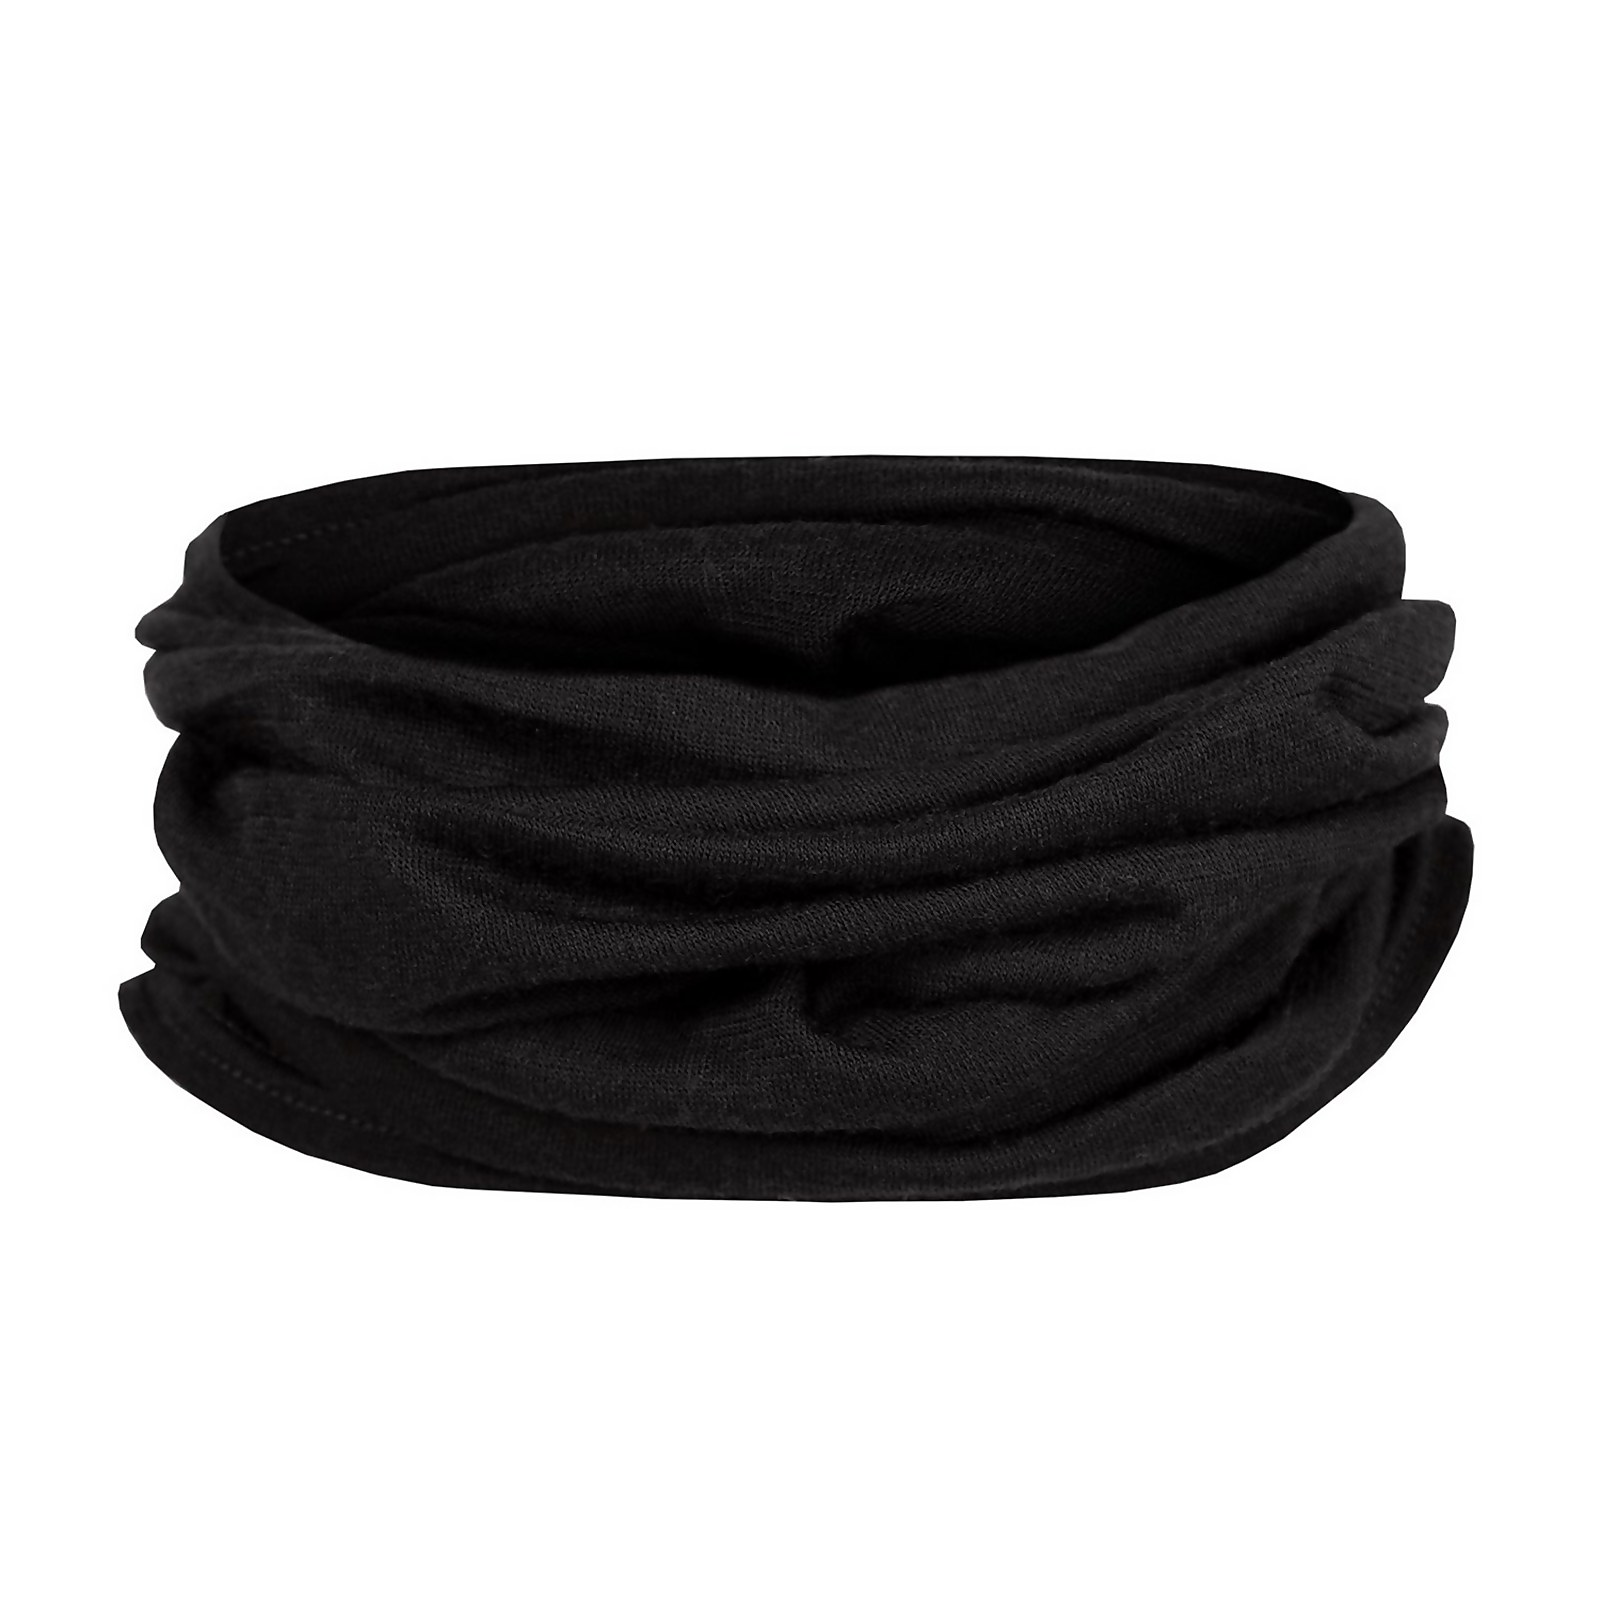 Baabaa Merino Tech Multitube - Black - One Size